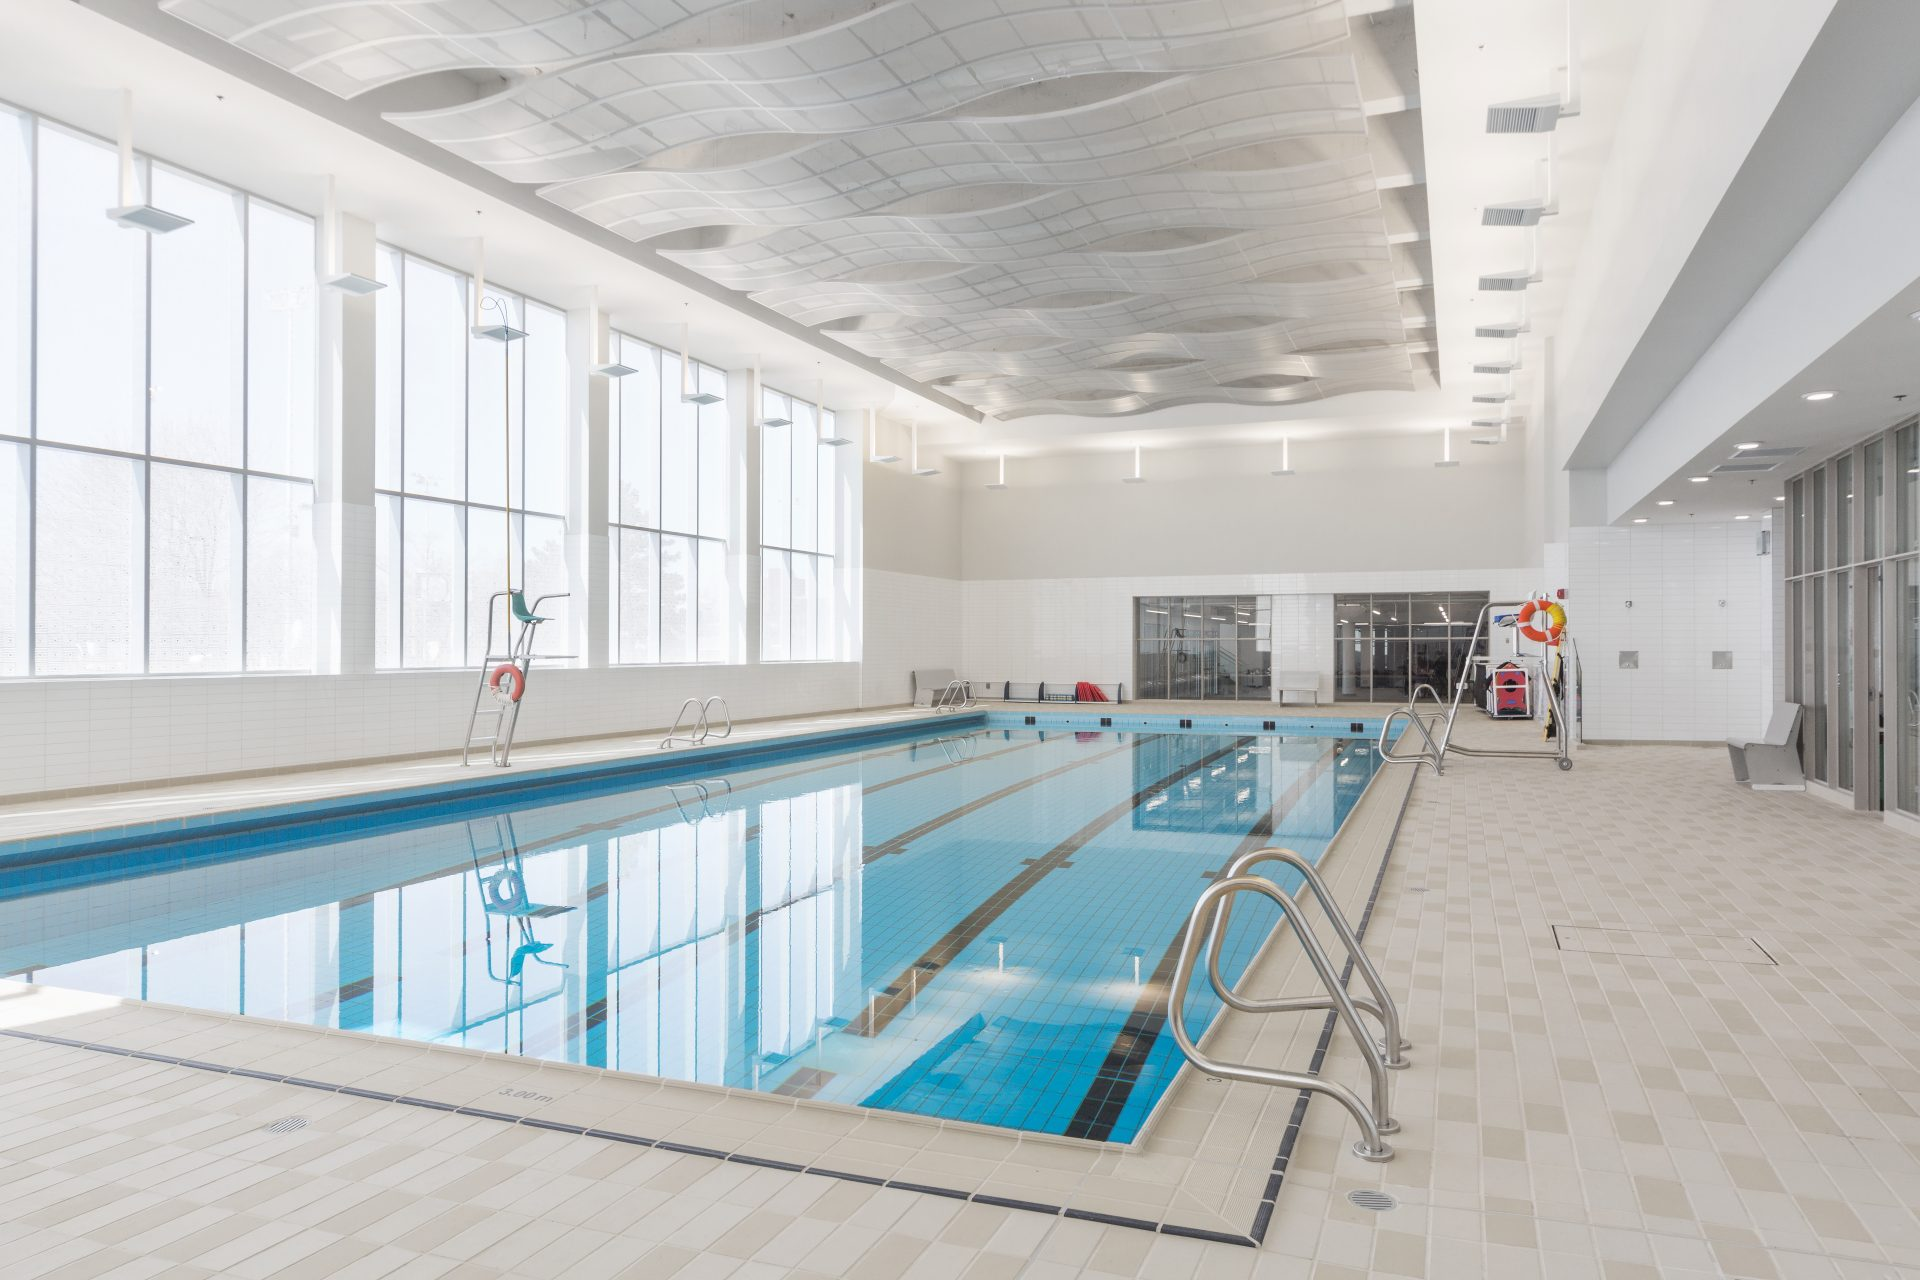 Centre Edouard-Rivest 13